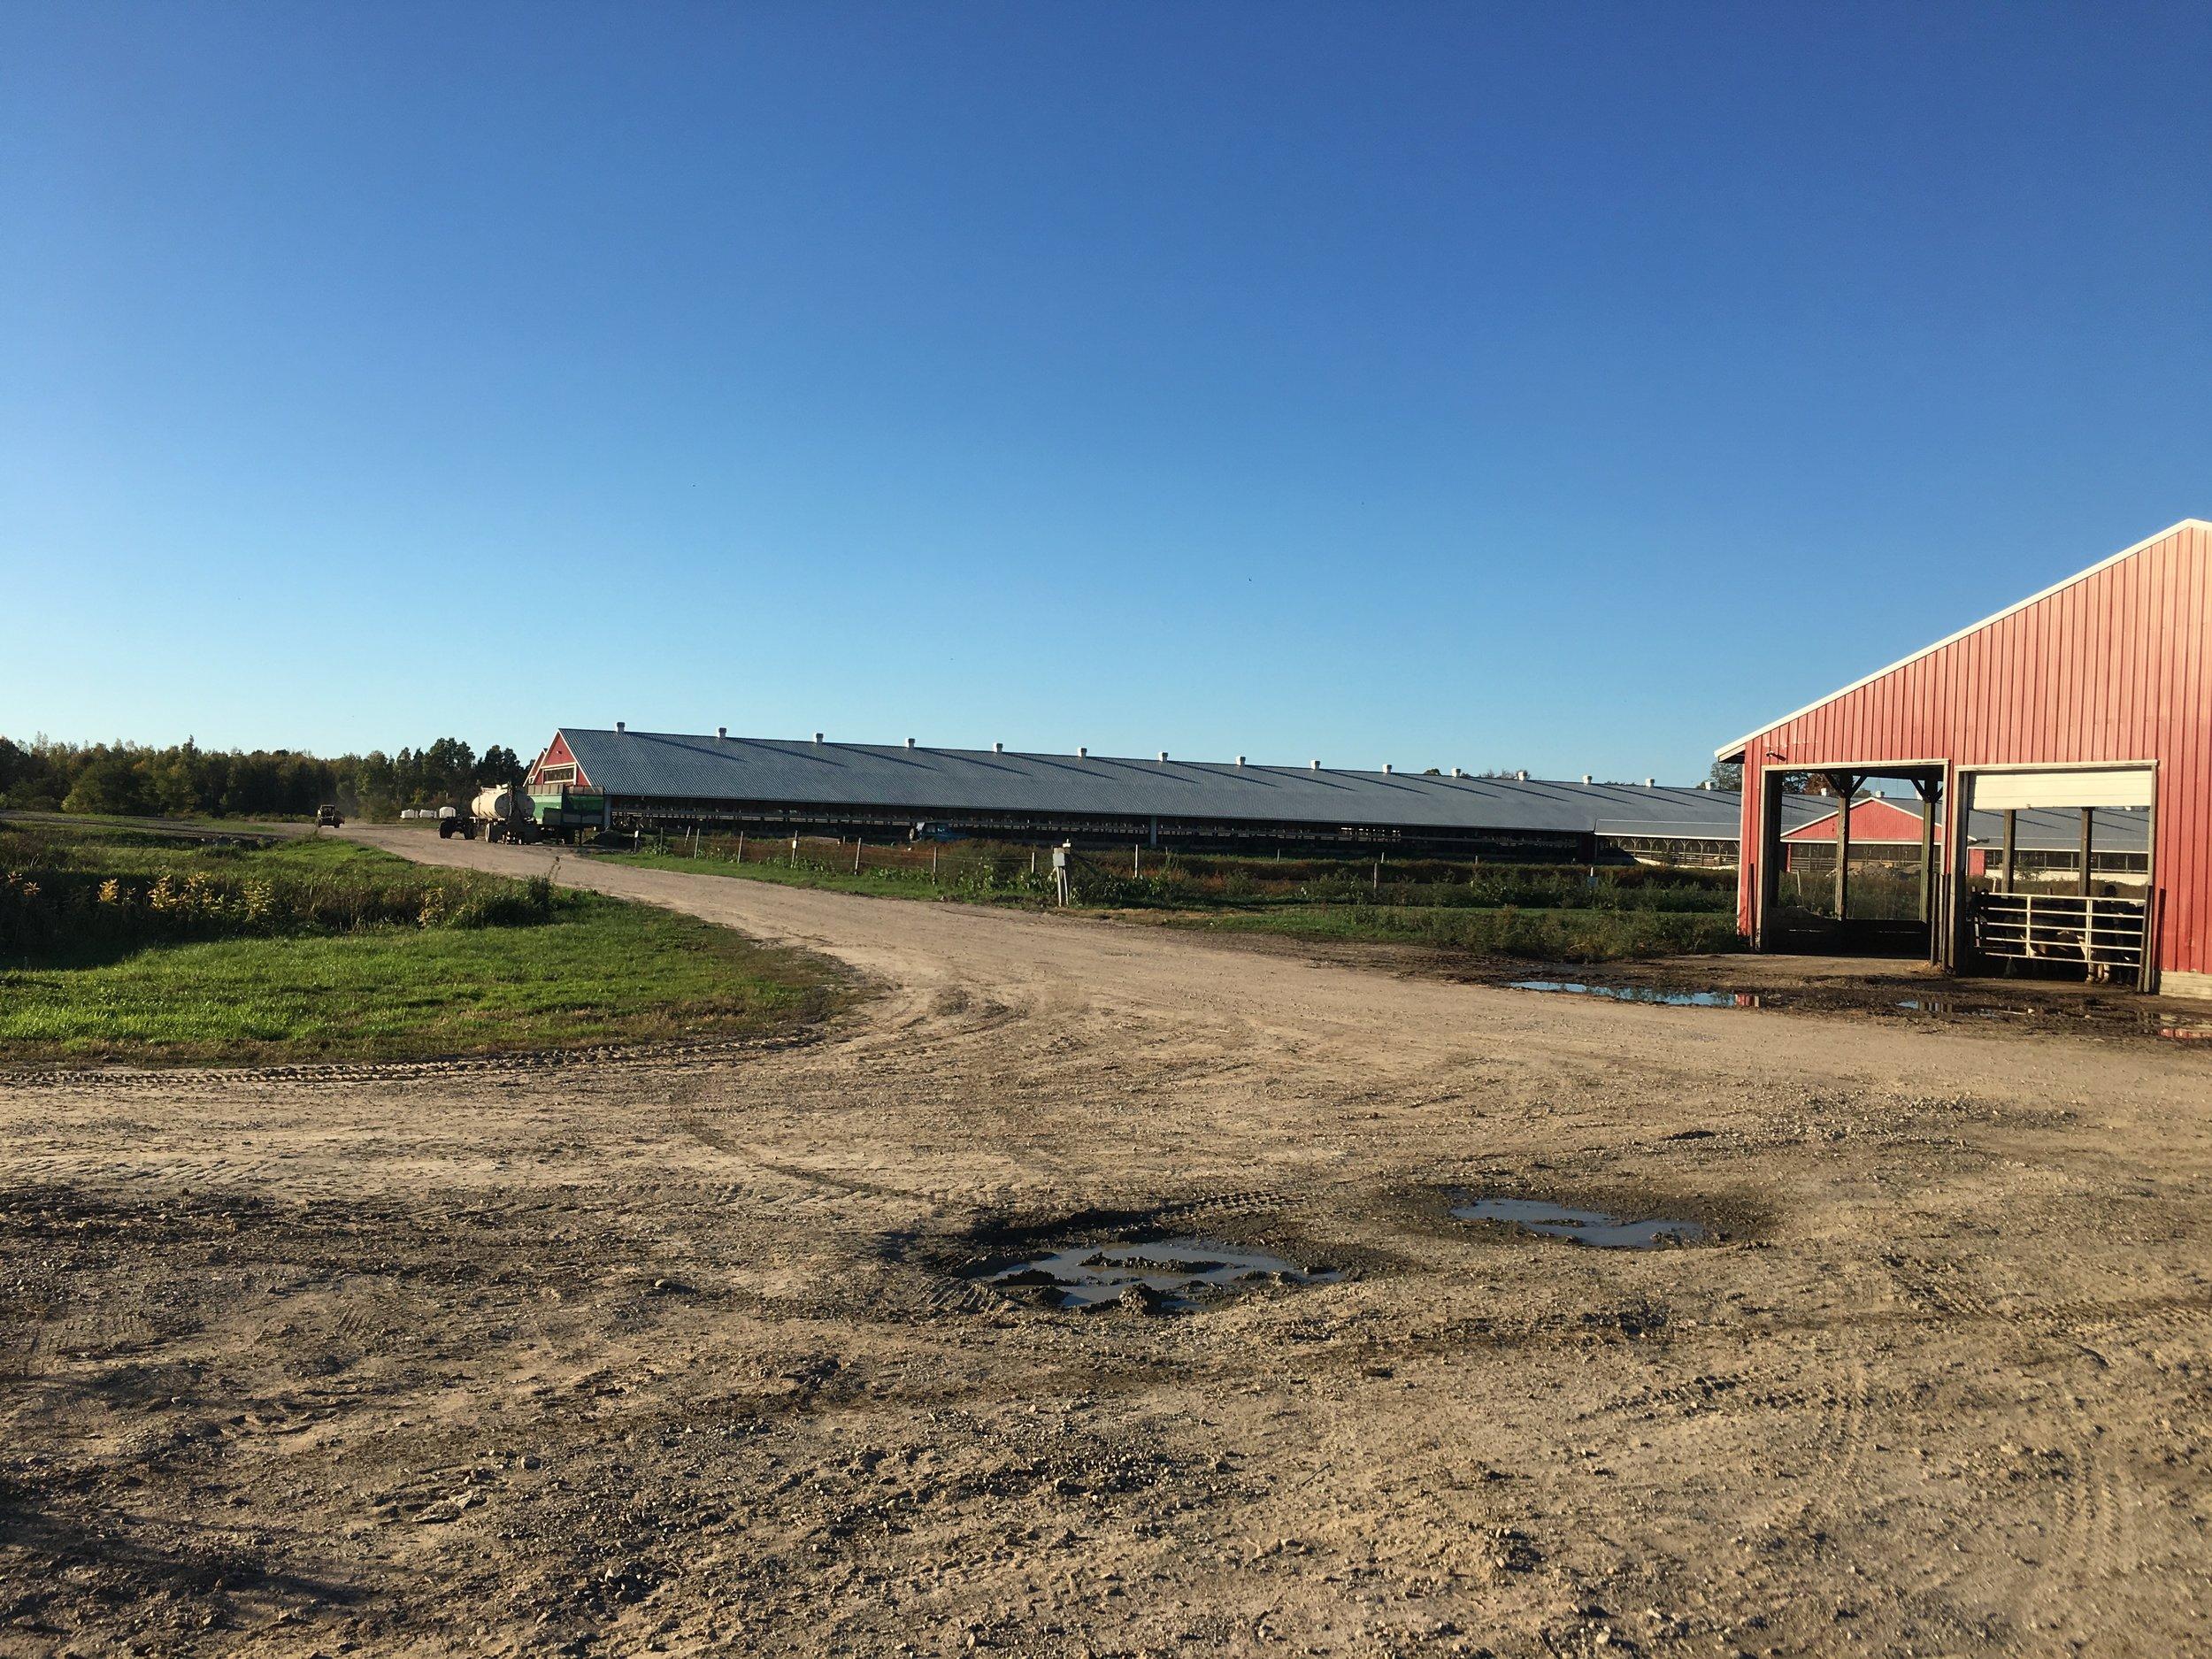 Dairy farm in Hermon, NY (Photo: Julianne DeGuardi)